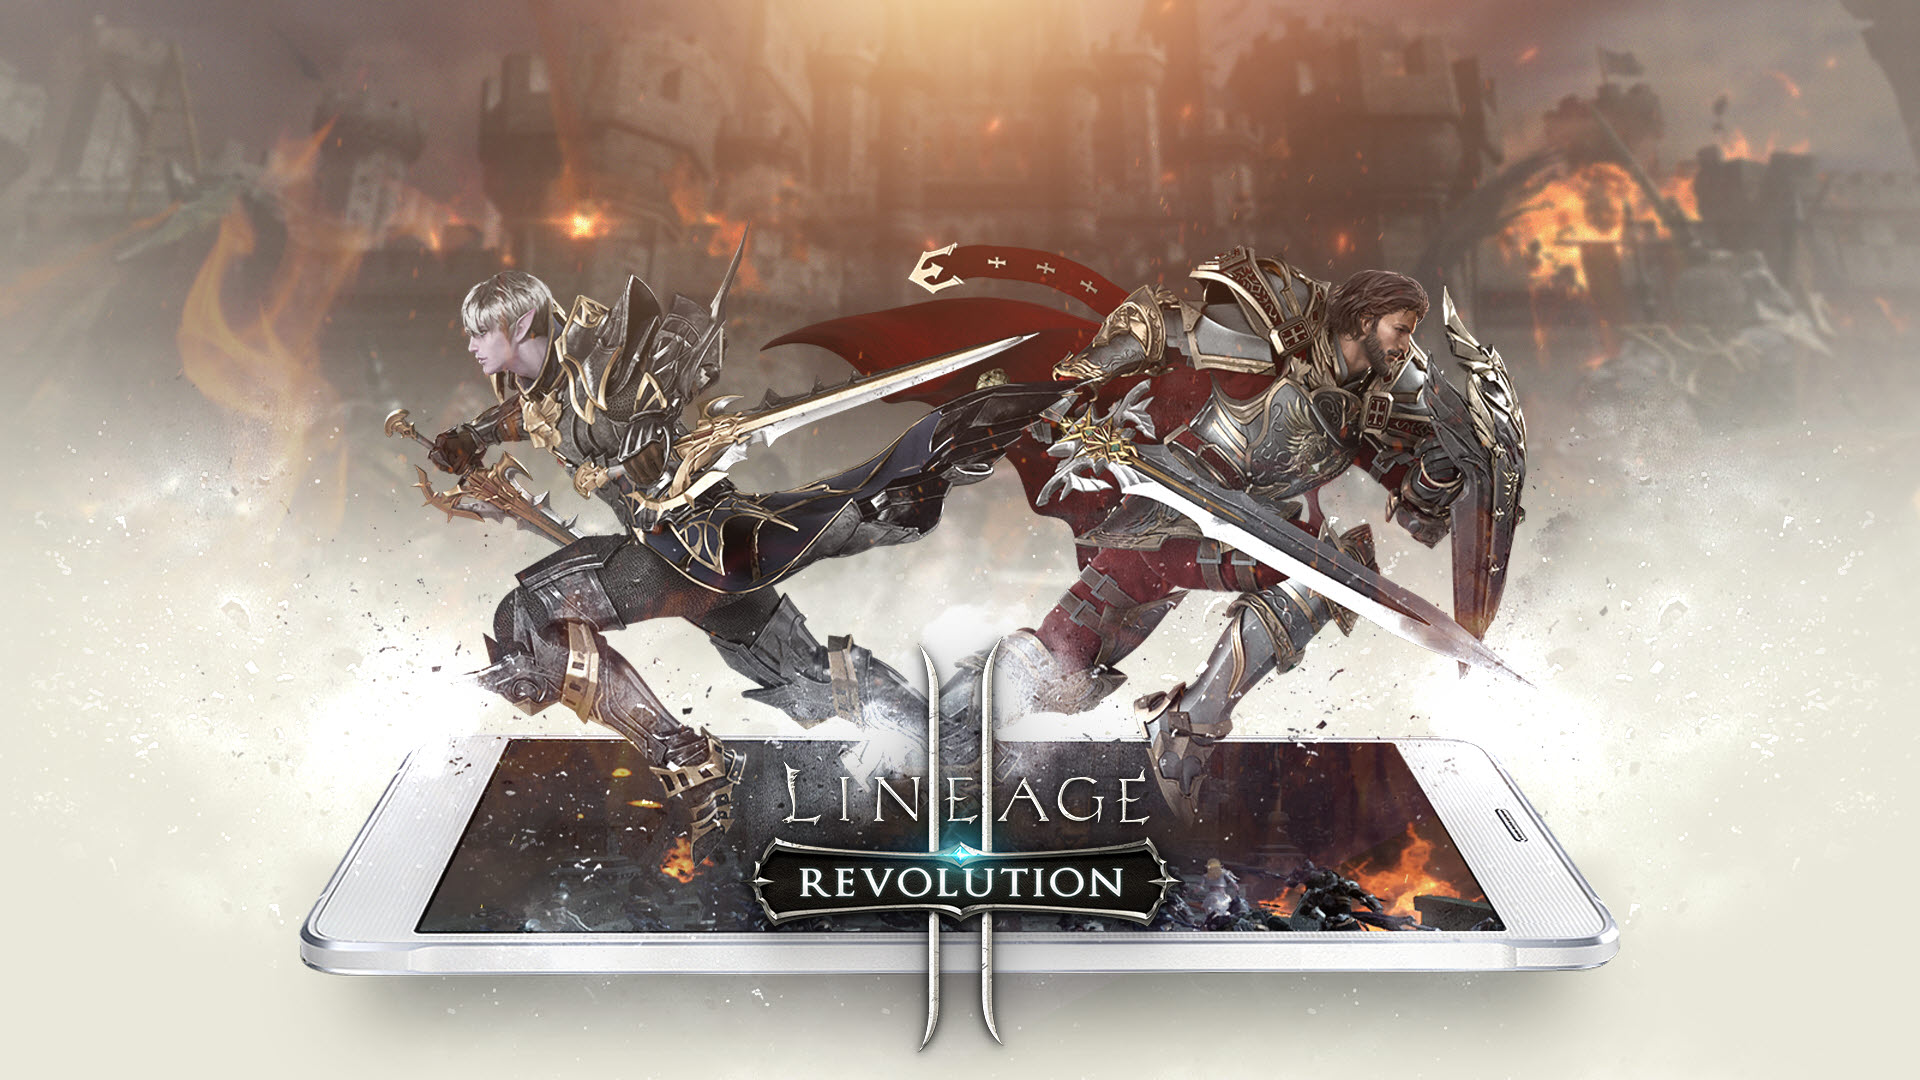 Lineage 2: Revolution celebrates gaining over 5 million